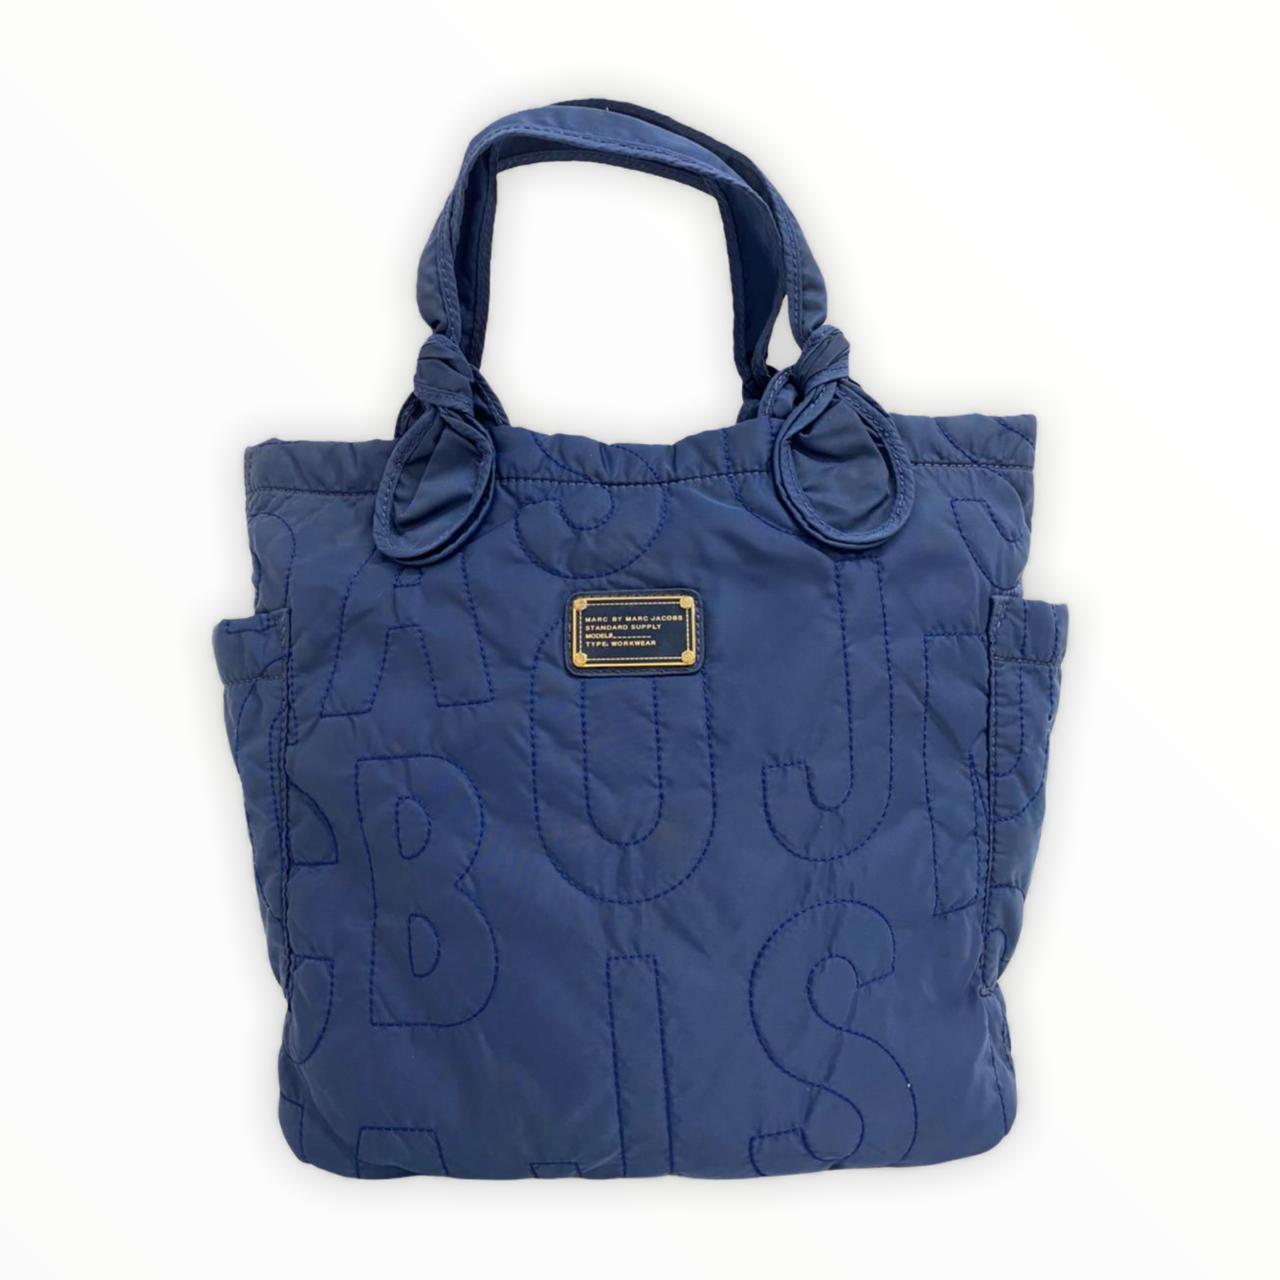 Bolsa Marc Jacobs Pretty Nylon Medium Tote Azul